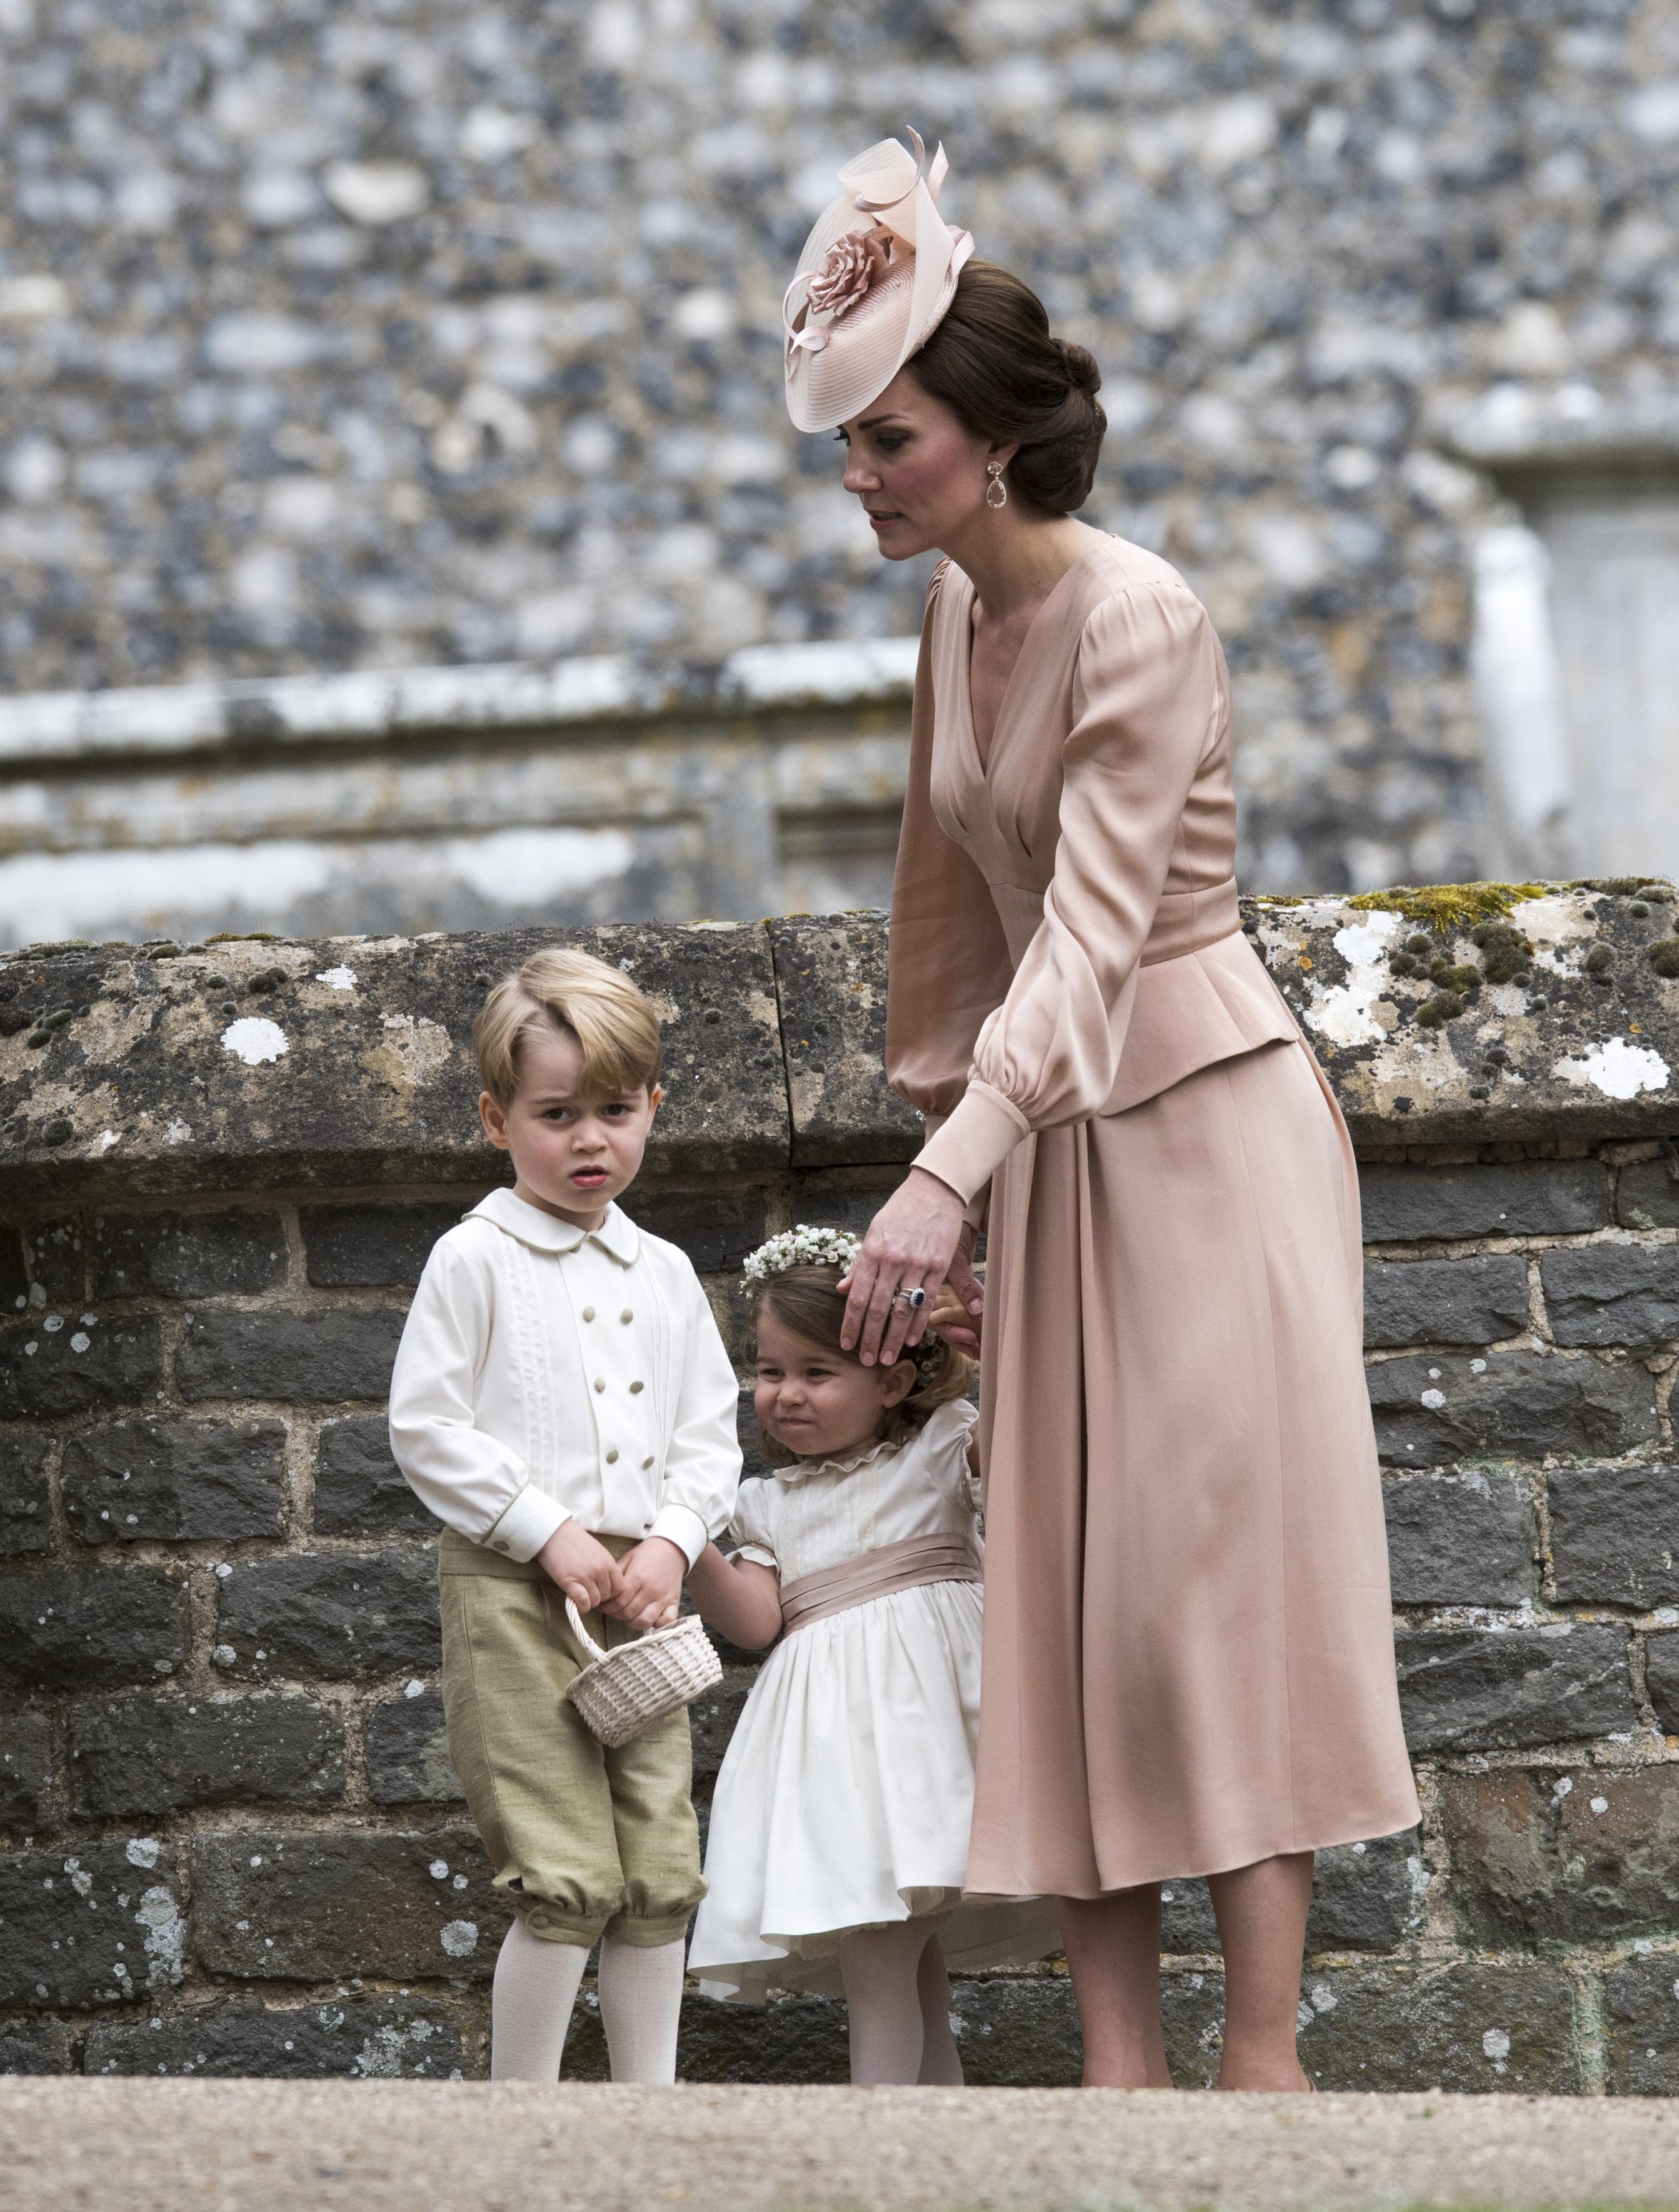 principe-george-princesa-charlotte-casamento-pippa-middleton